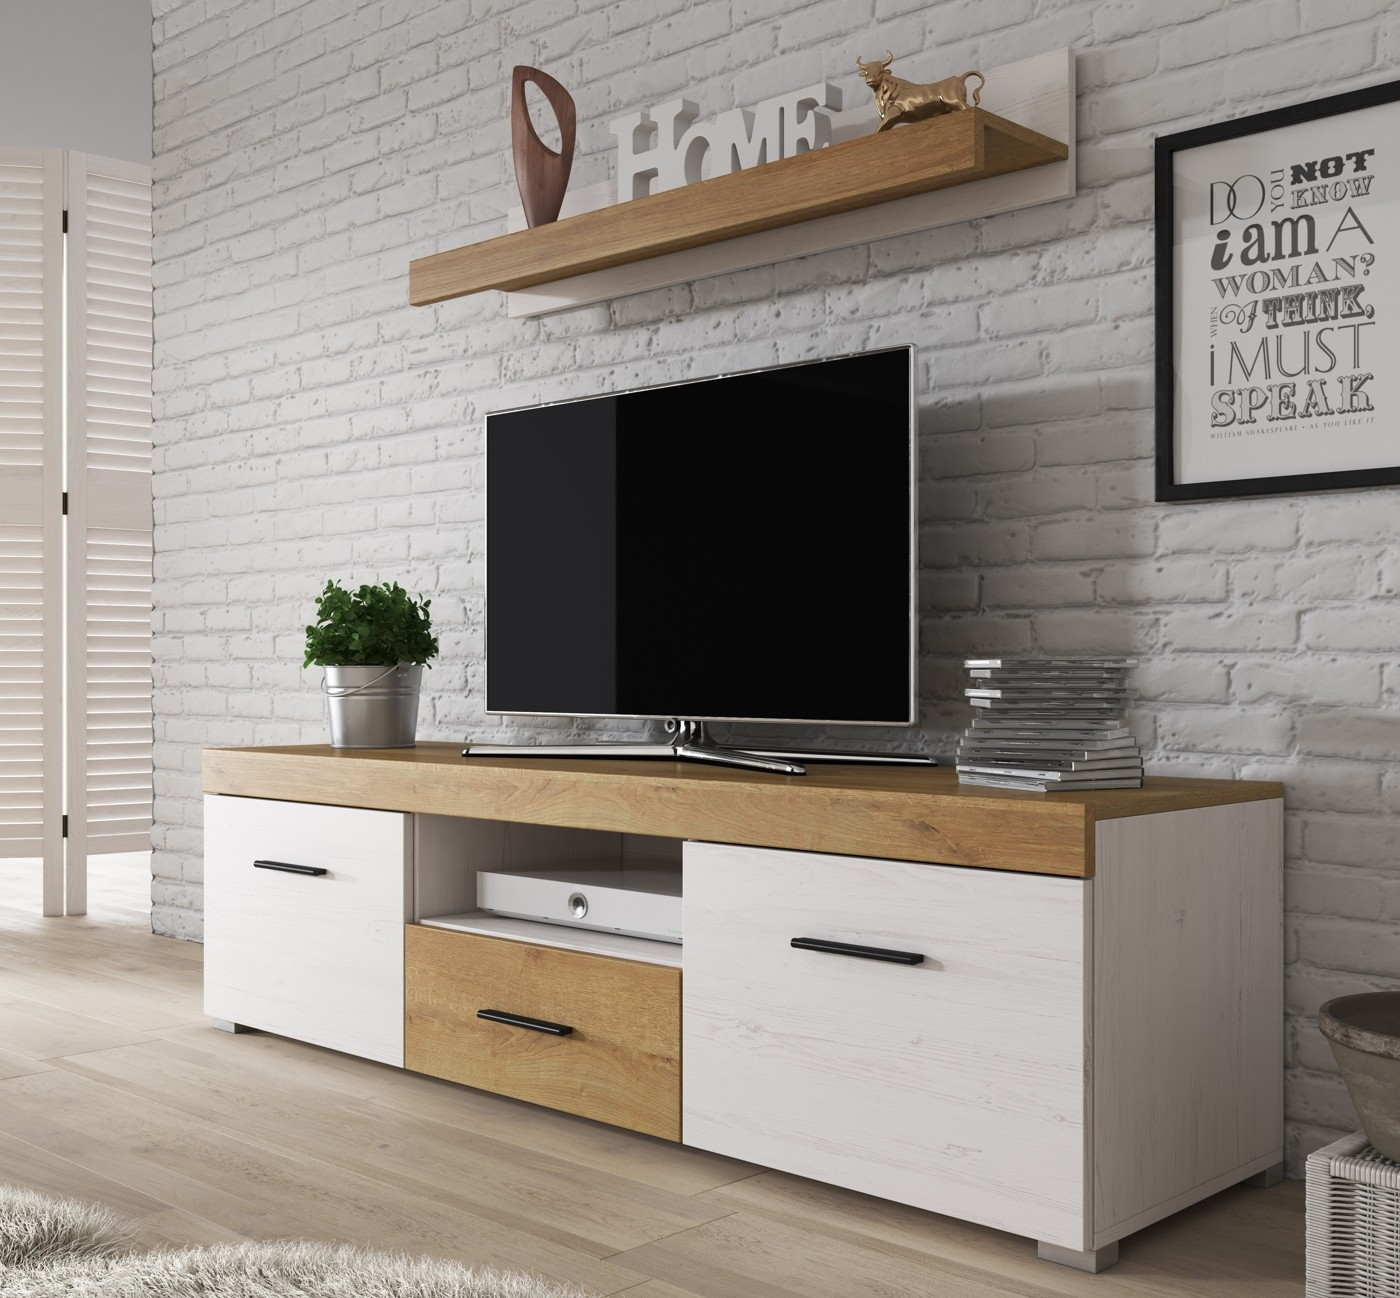 Wandplank Diepte 40 Cm.Tv Meubel Farley Wandplank Wit Eiken Eiken 150 Cm Meubella